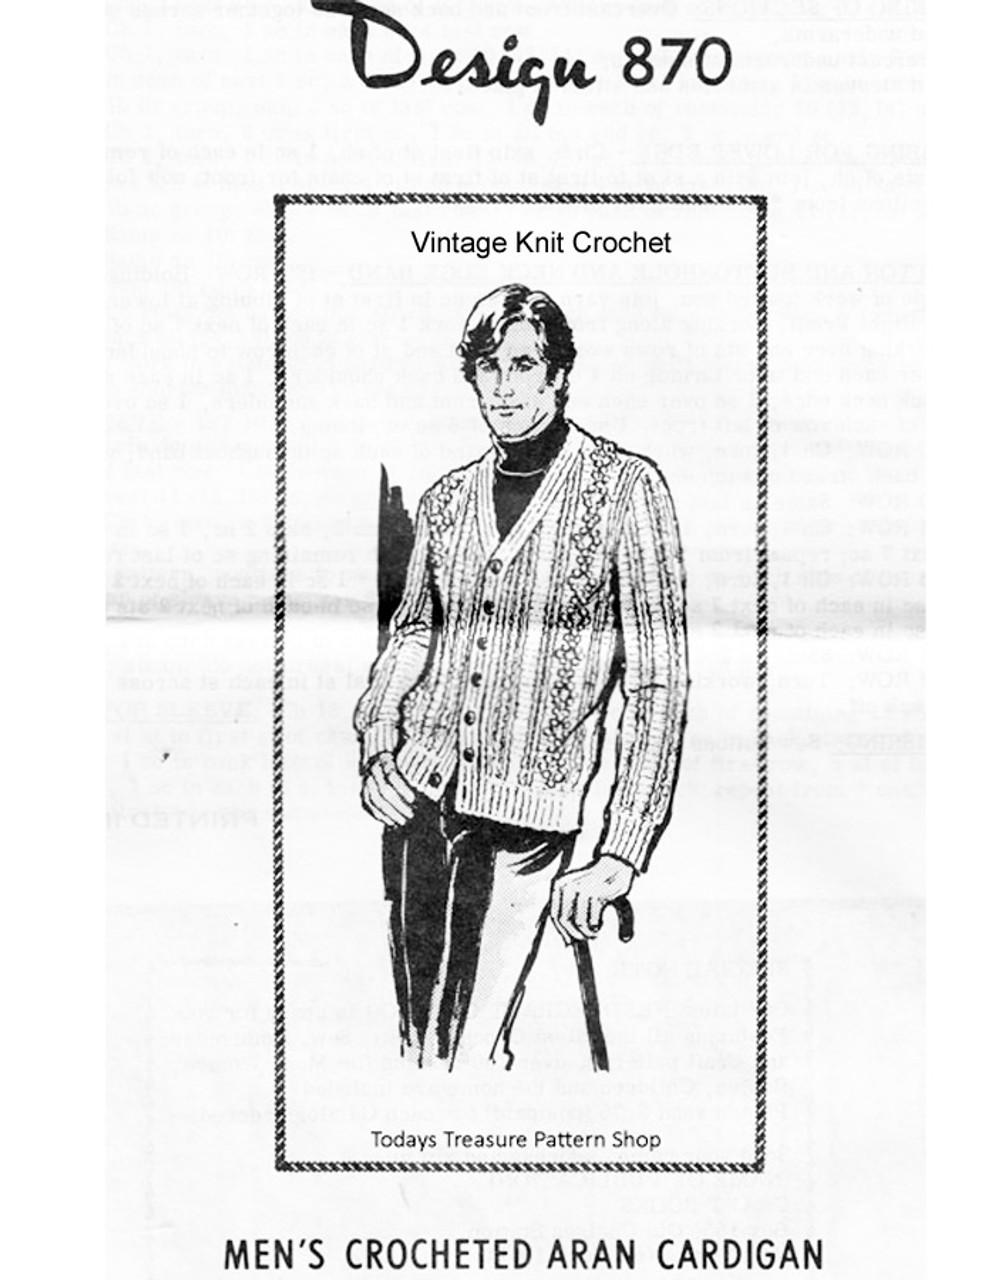 Mans Crochet Aran Cardigan Pattern, Mail Order Design 870